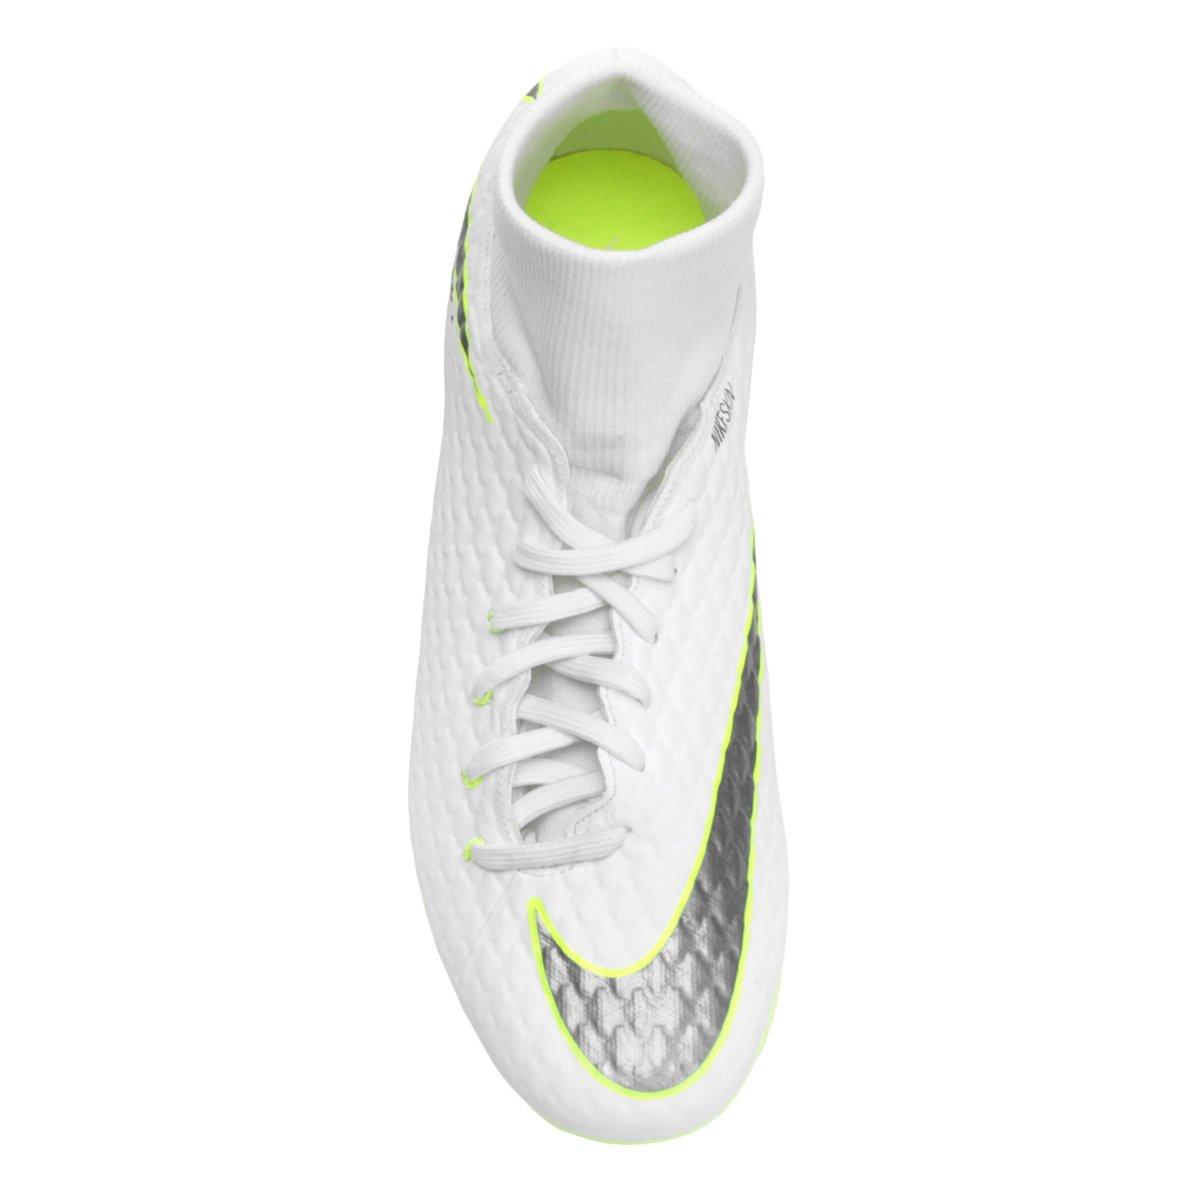 Campo DF Branco Nike FG Phantom 3 Chuteira Academy e Hypervenom Cinza Masculina d4n6YYz